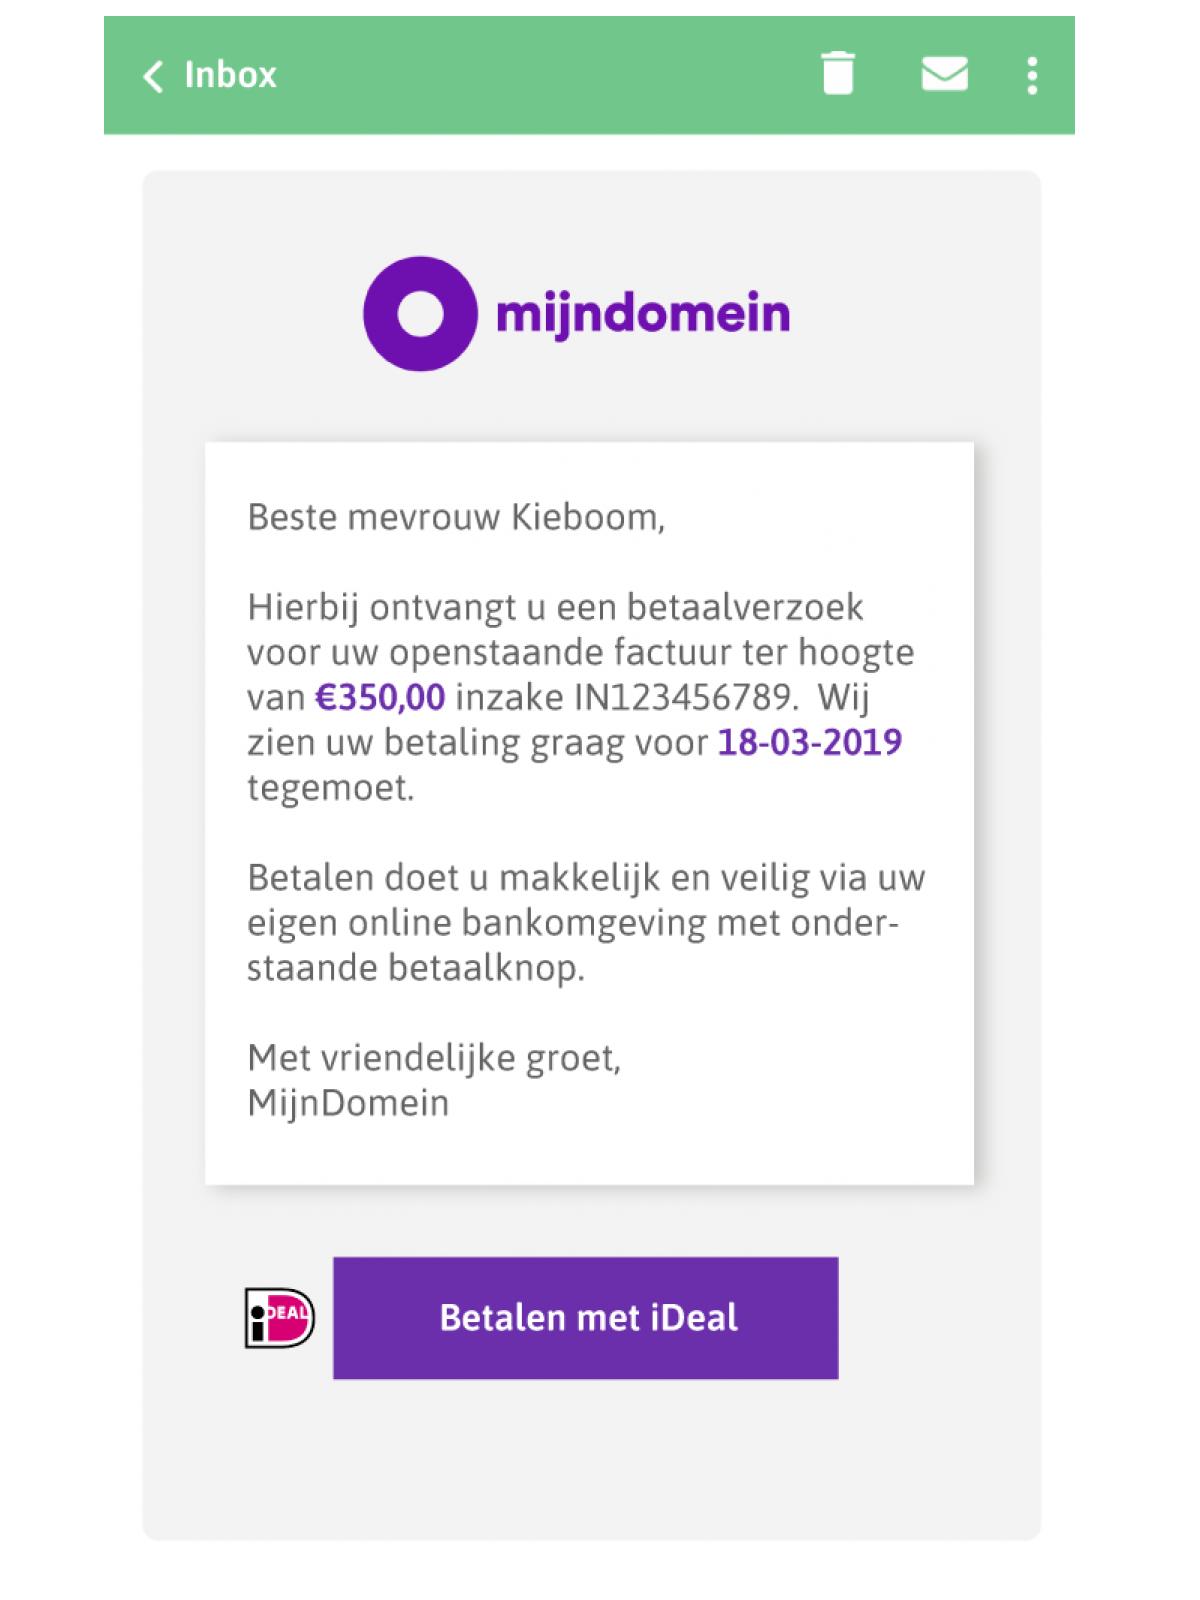 1-E-mail-Inbox-01